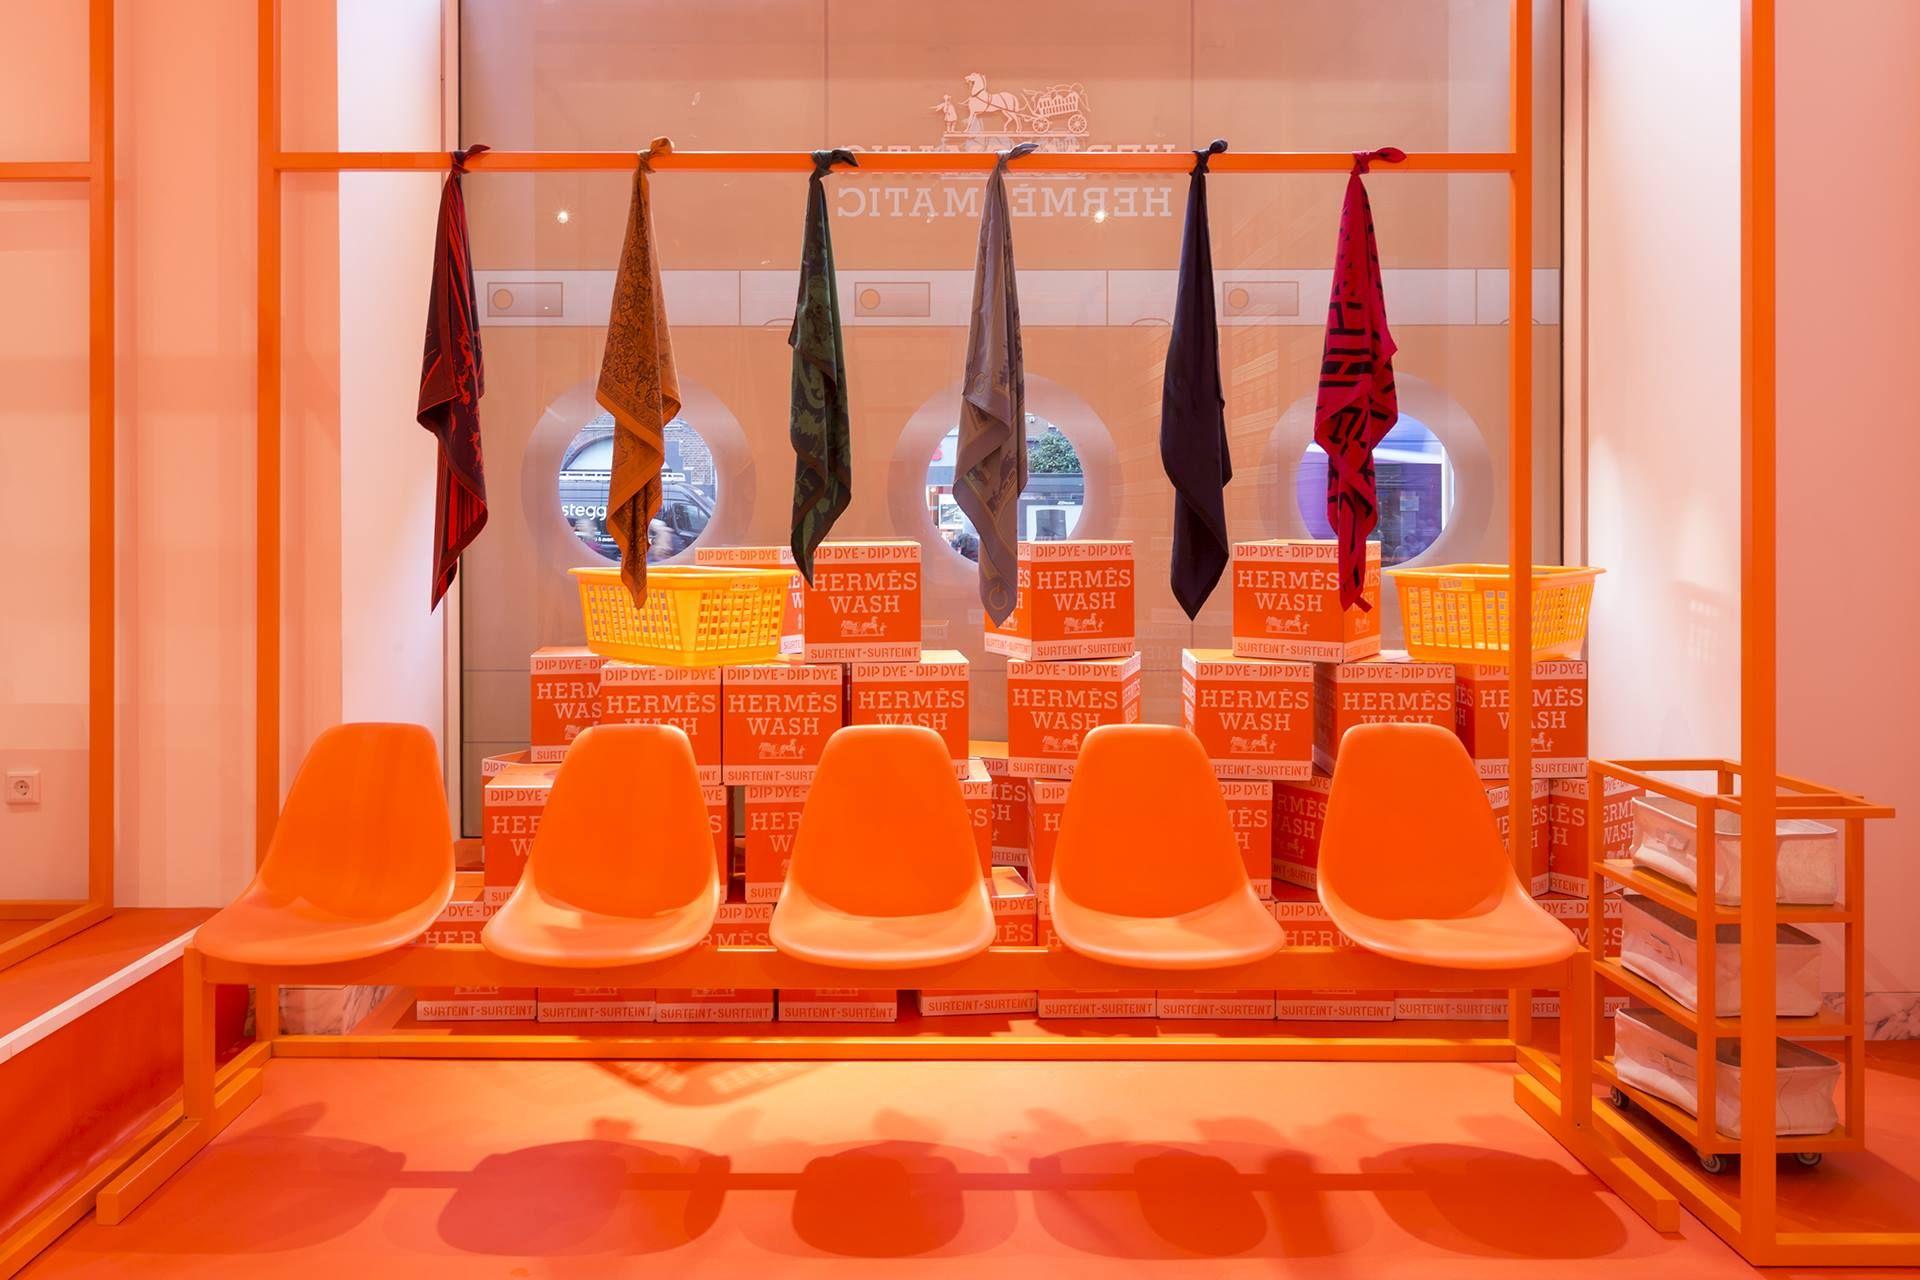 Hermès's Pop-Up Store Hermèsmatic